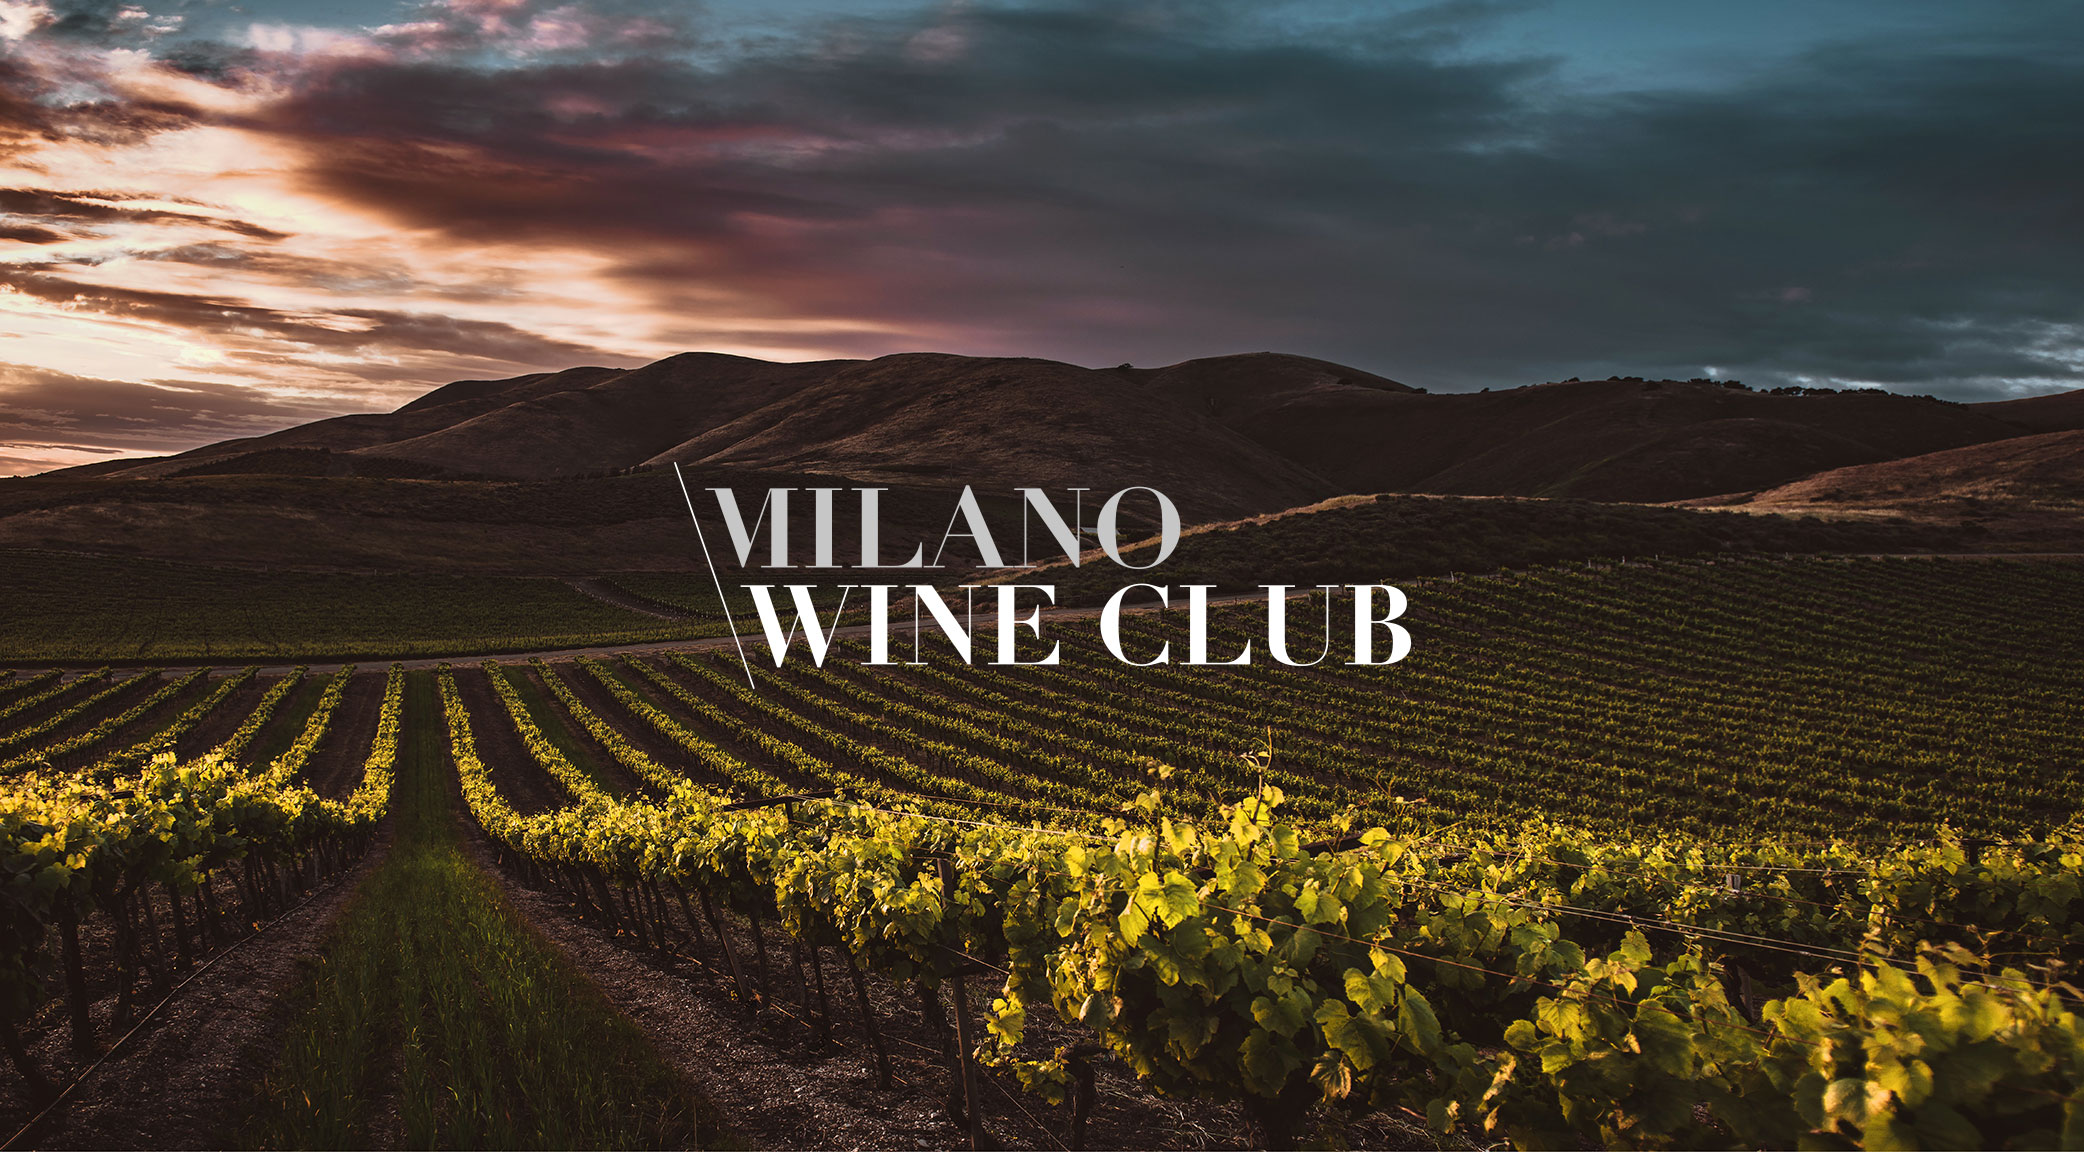 Milano Wine Club